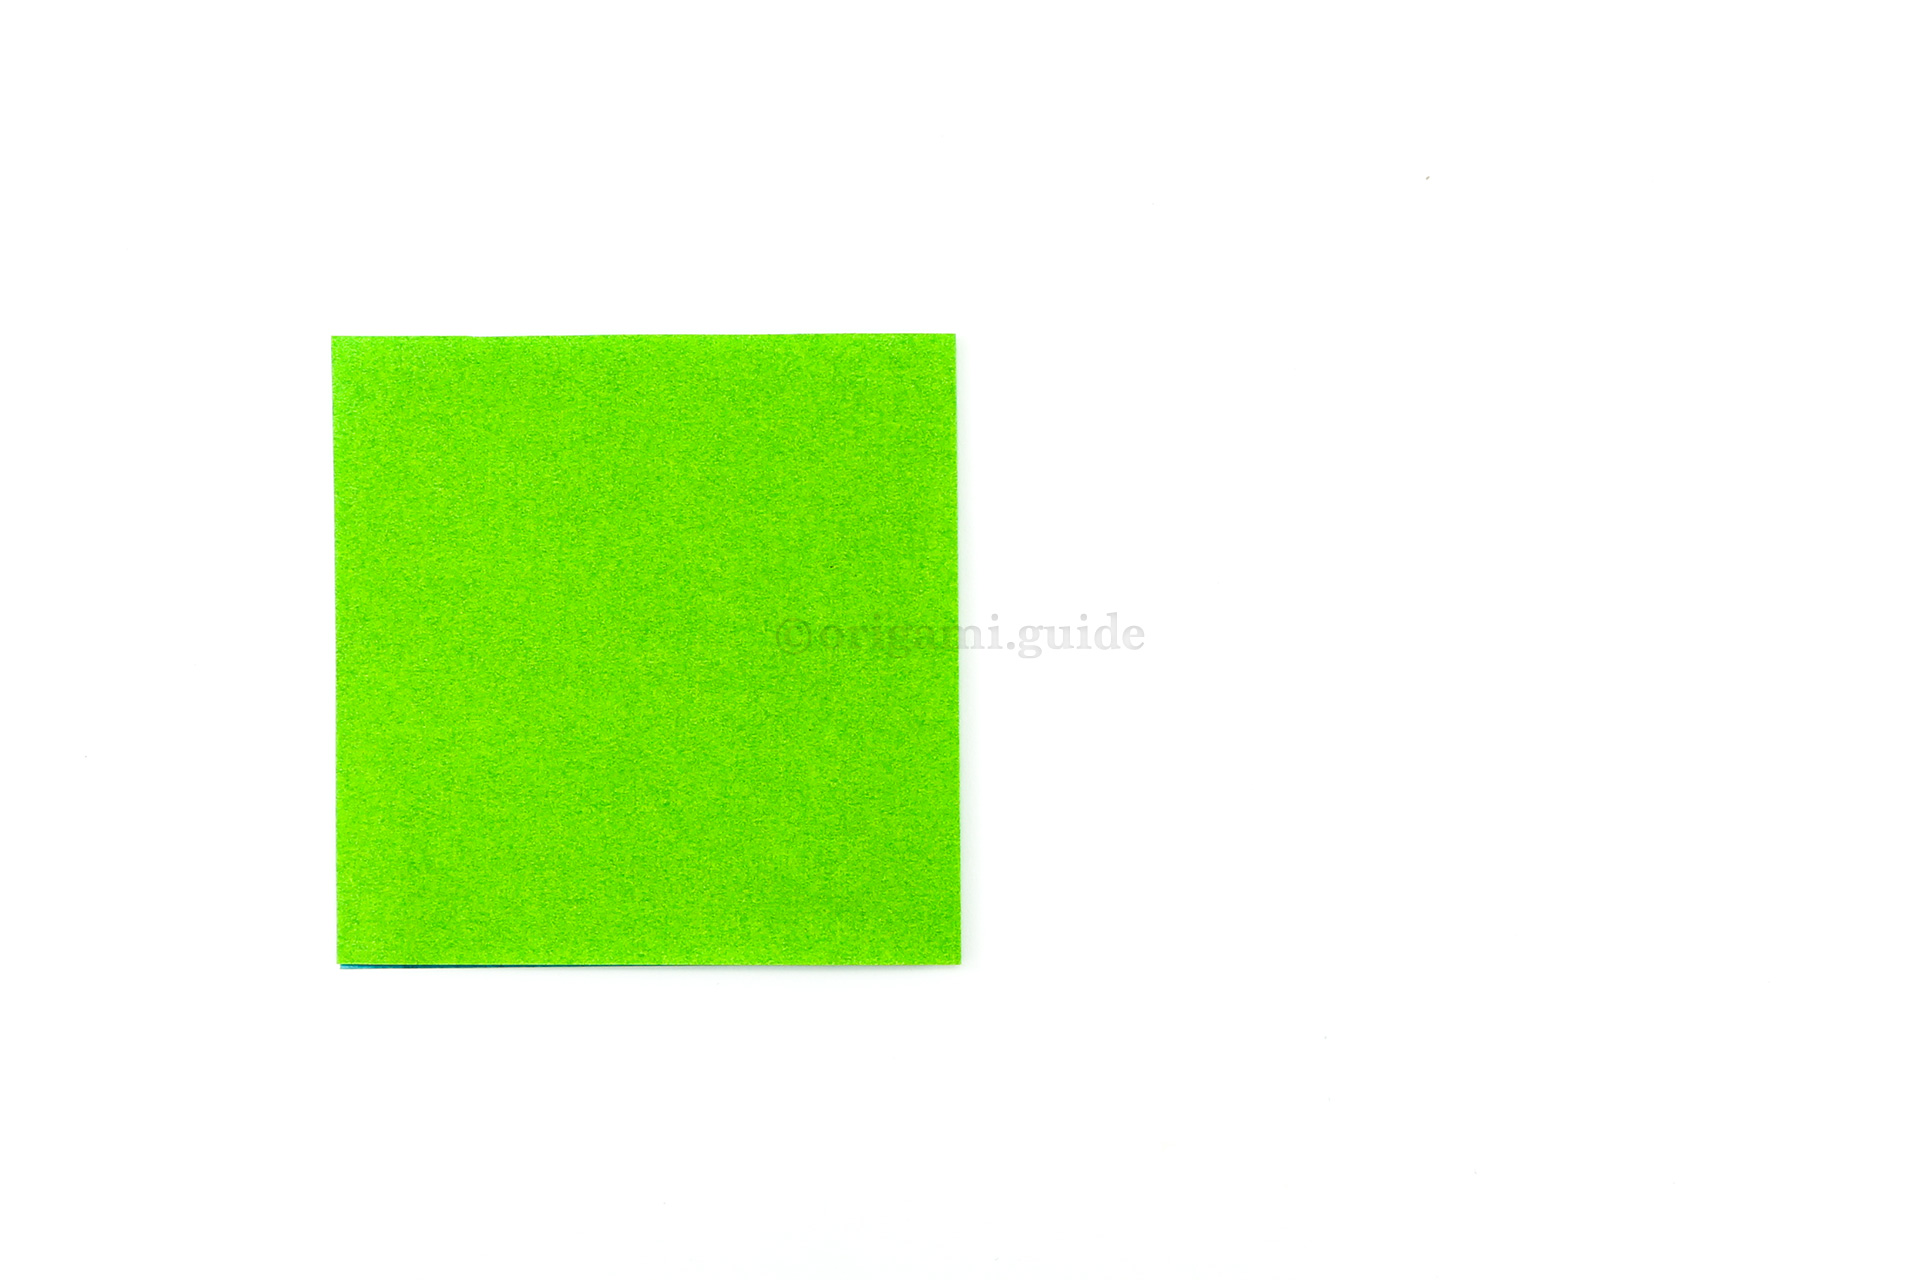 Examples of rigid foldable origami. (a) Miura-ori. (b) DCS. (c ...   1280x1920